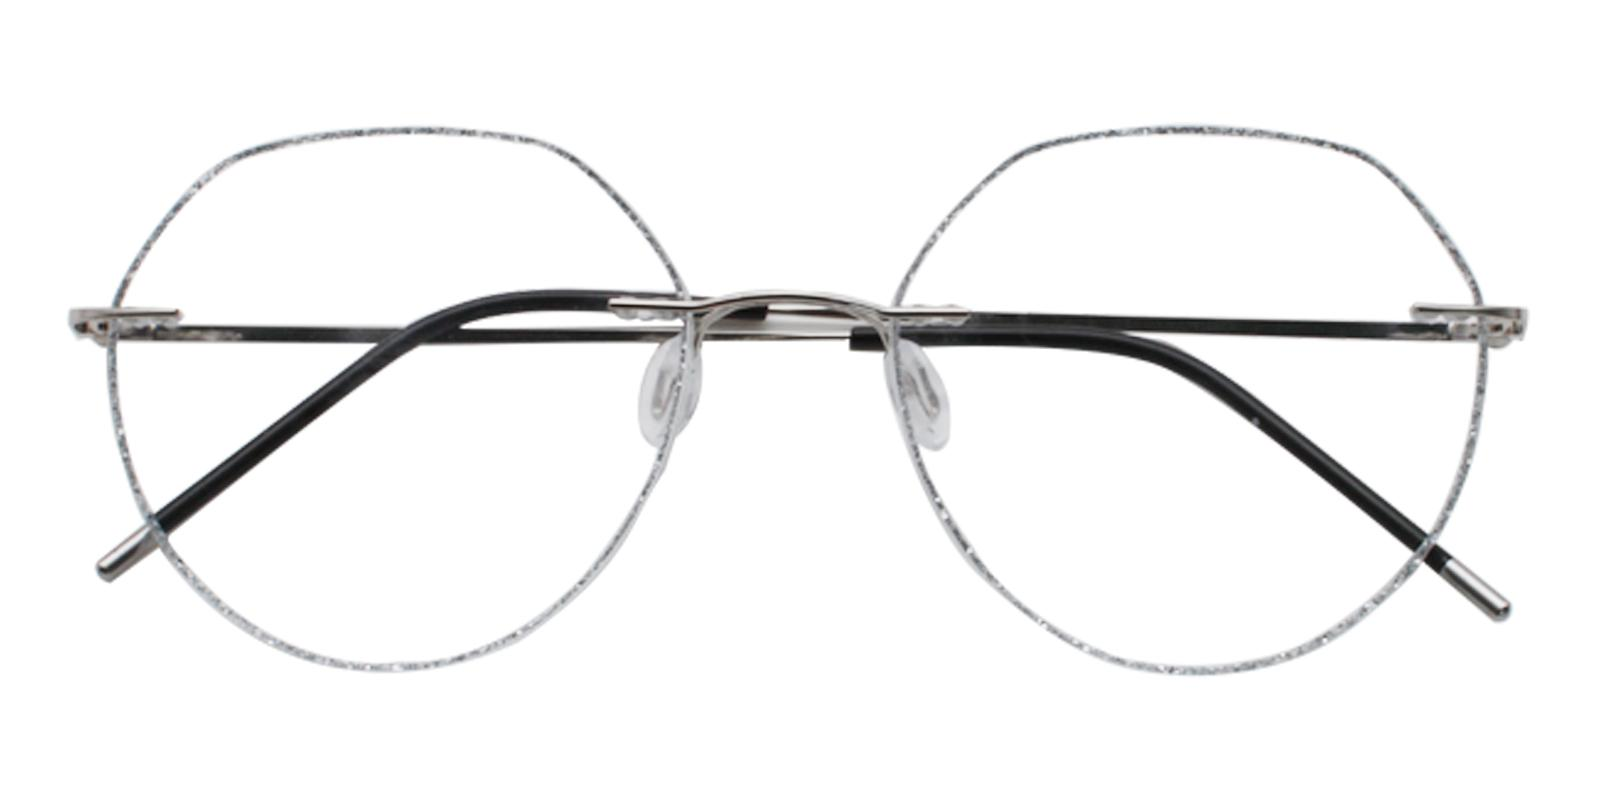 Piper Silver Titanium NosePads , Eyeglasses Frames from ABBE Glasses